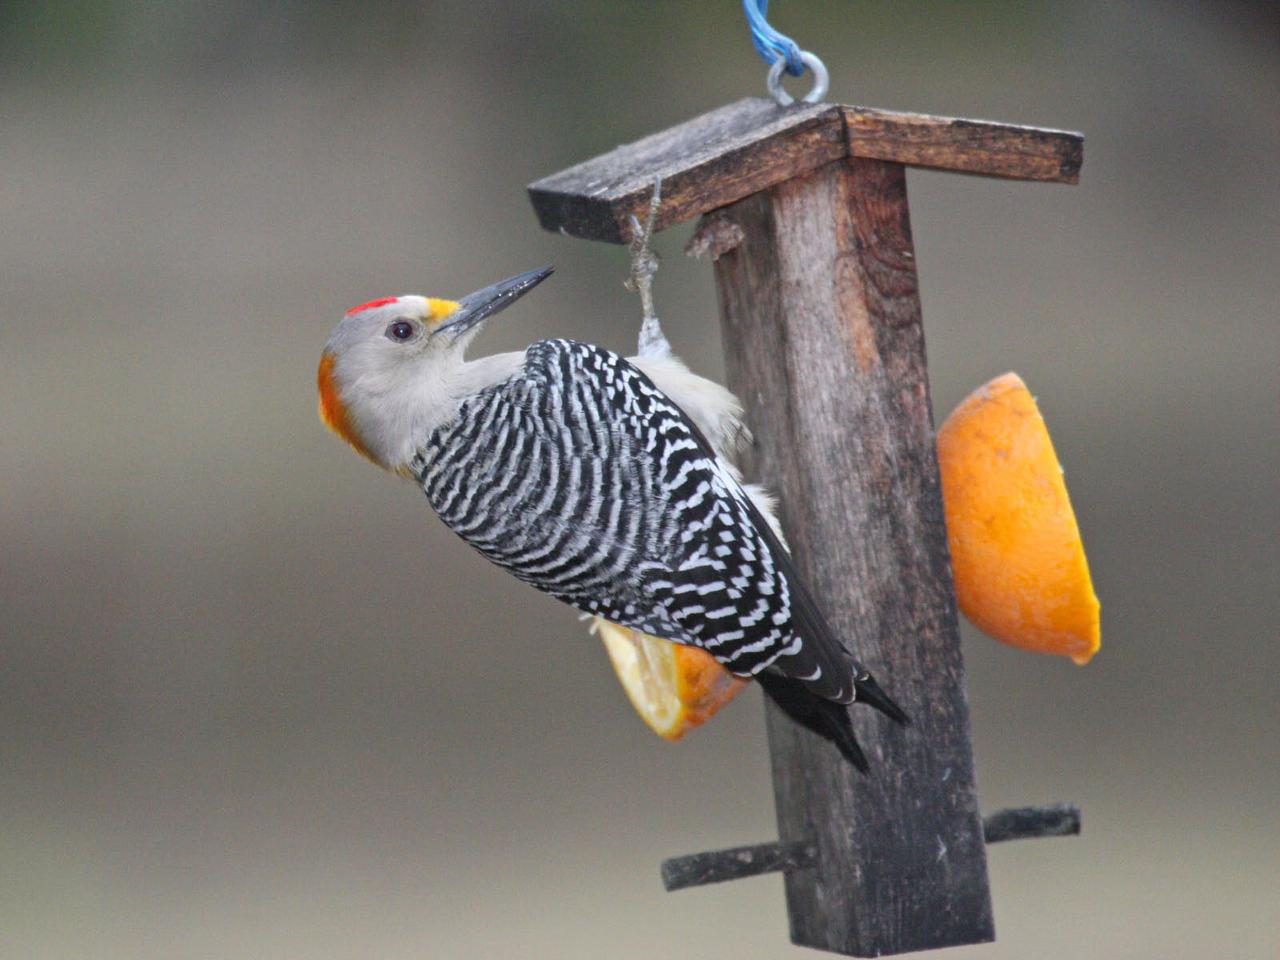 Golden-fronted Woodpecker - Bentsen Rio Grande Valley State Park - Mission, TX